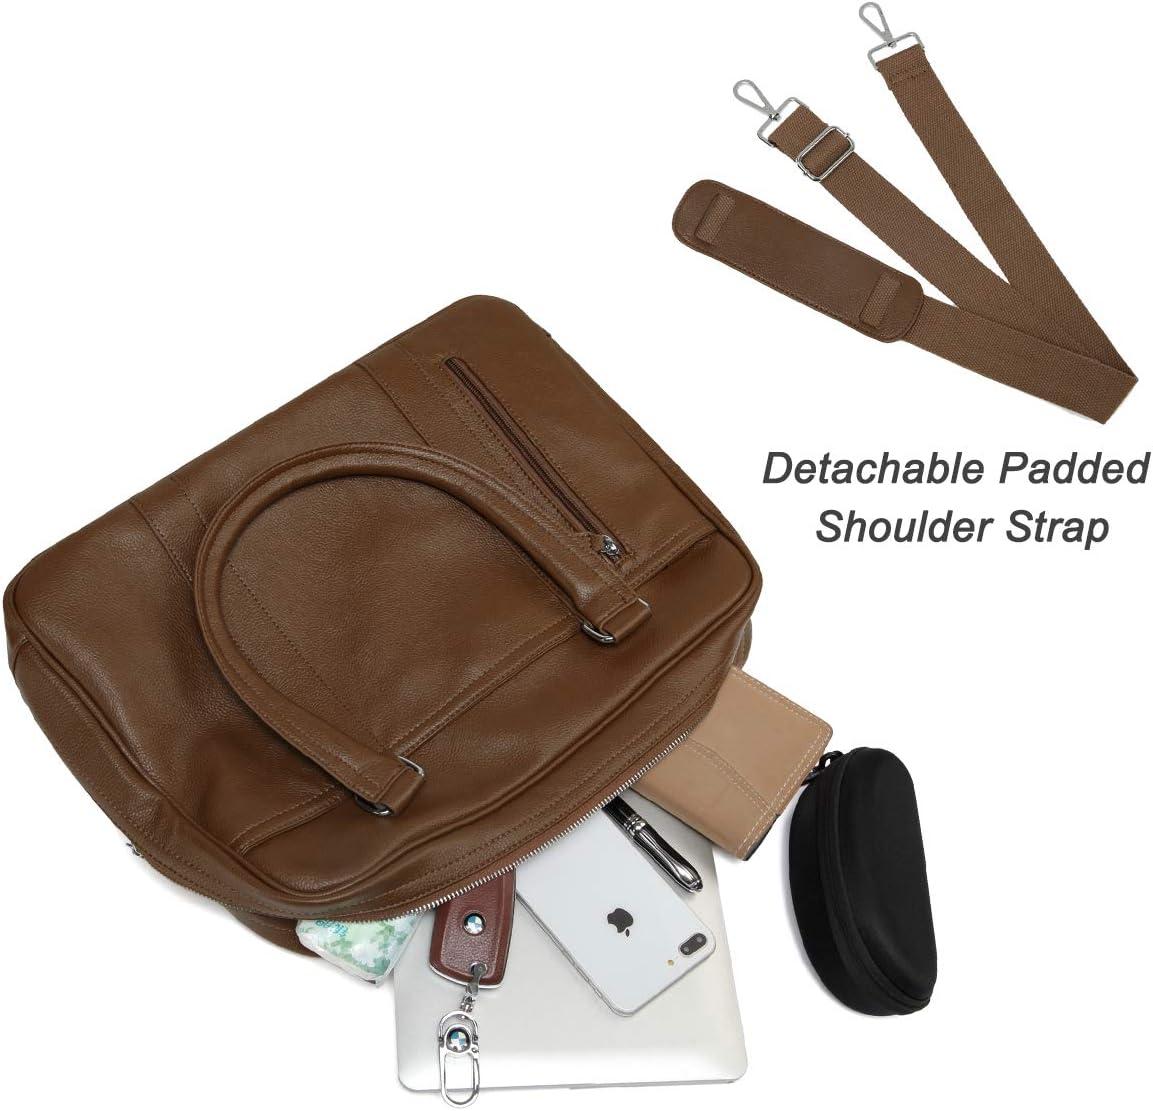 Women VASCHY PU Leather Water Resistant Business Briefcase 14 Inch Laptop Messenger Bag Shoulder Bag Classic Satchel for Work Brown Laptop Bag for Men